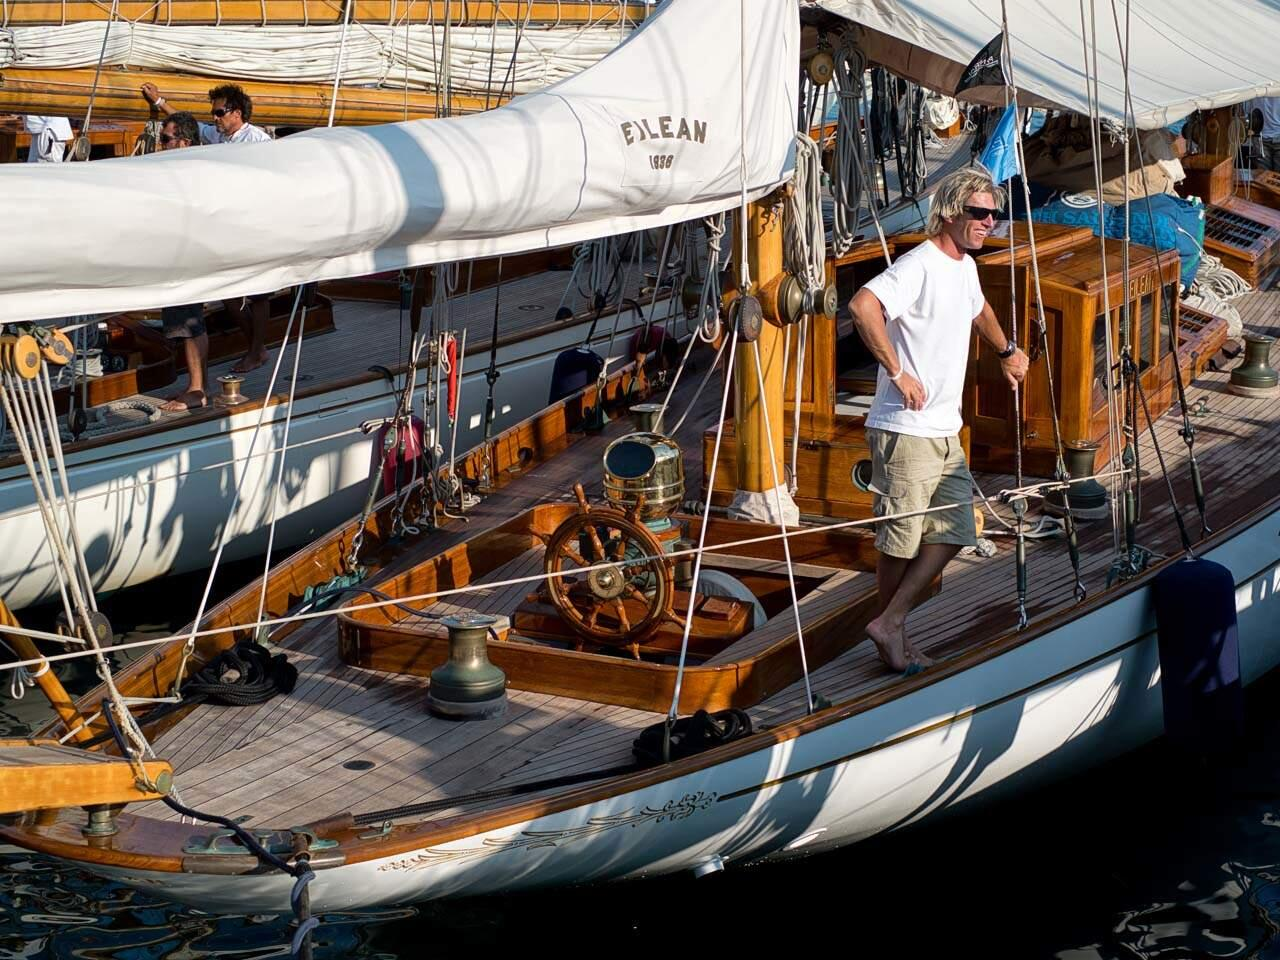 sailing boat panerai regatta purjevene